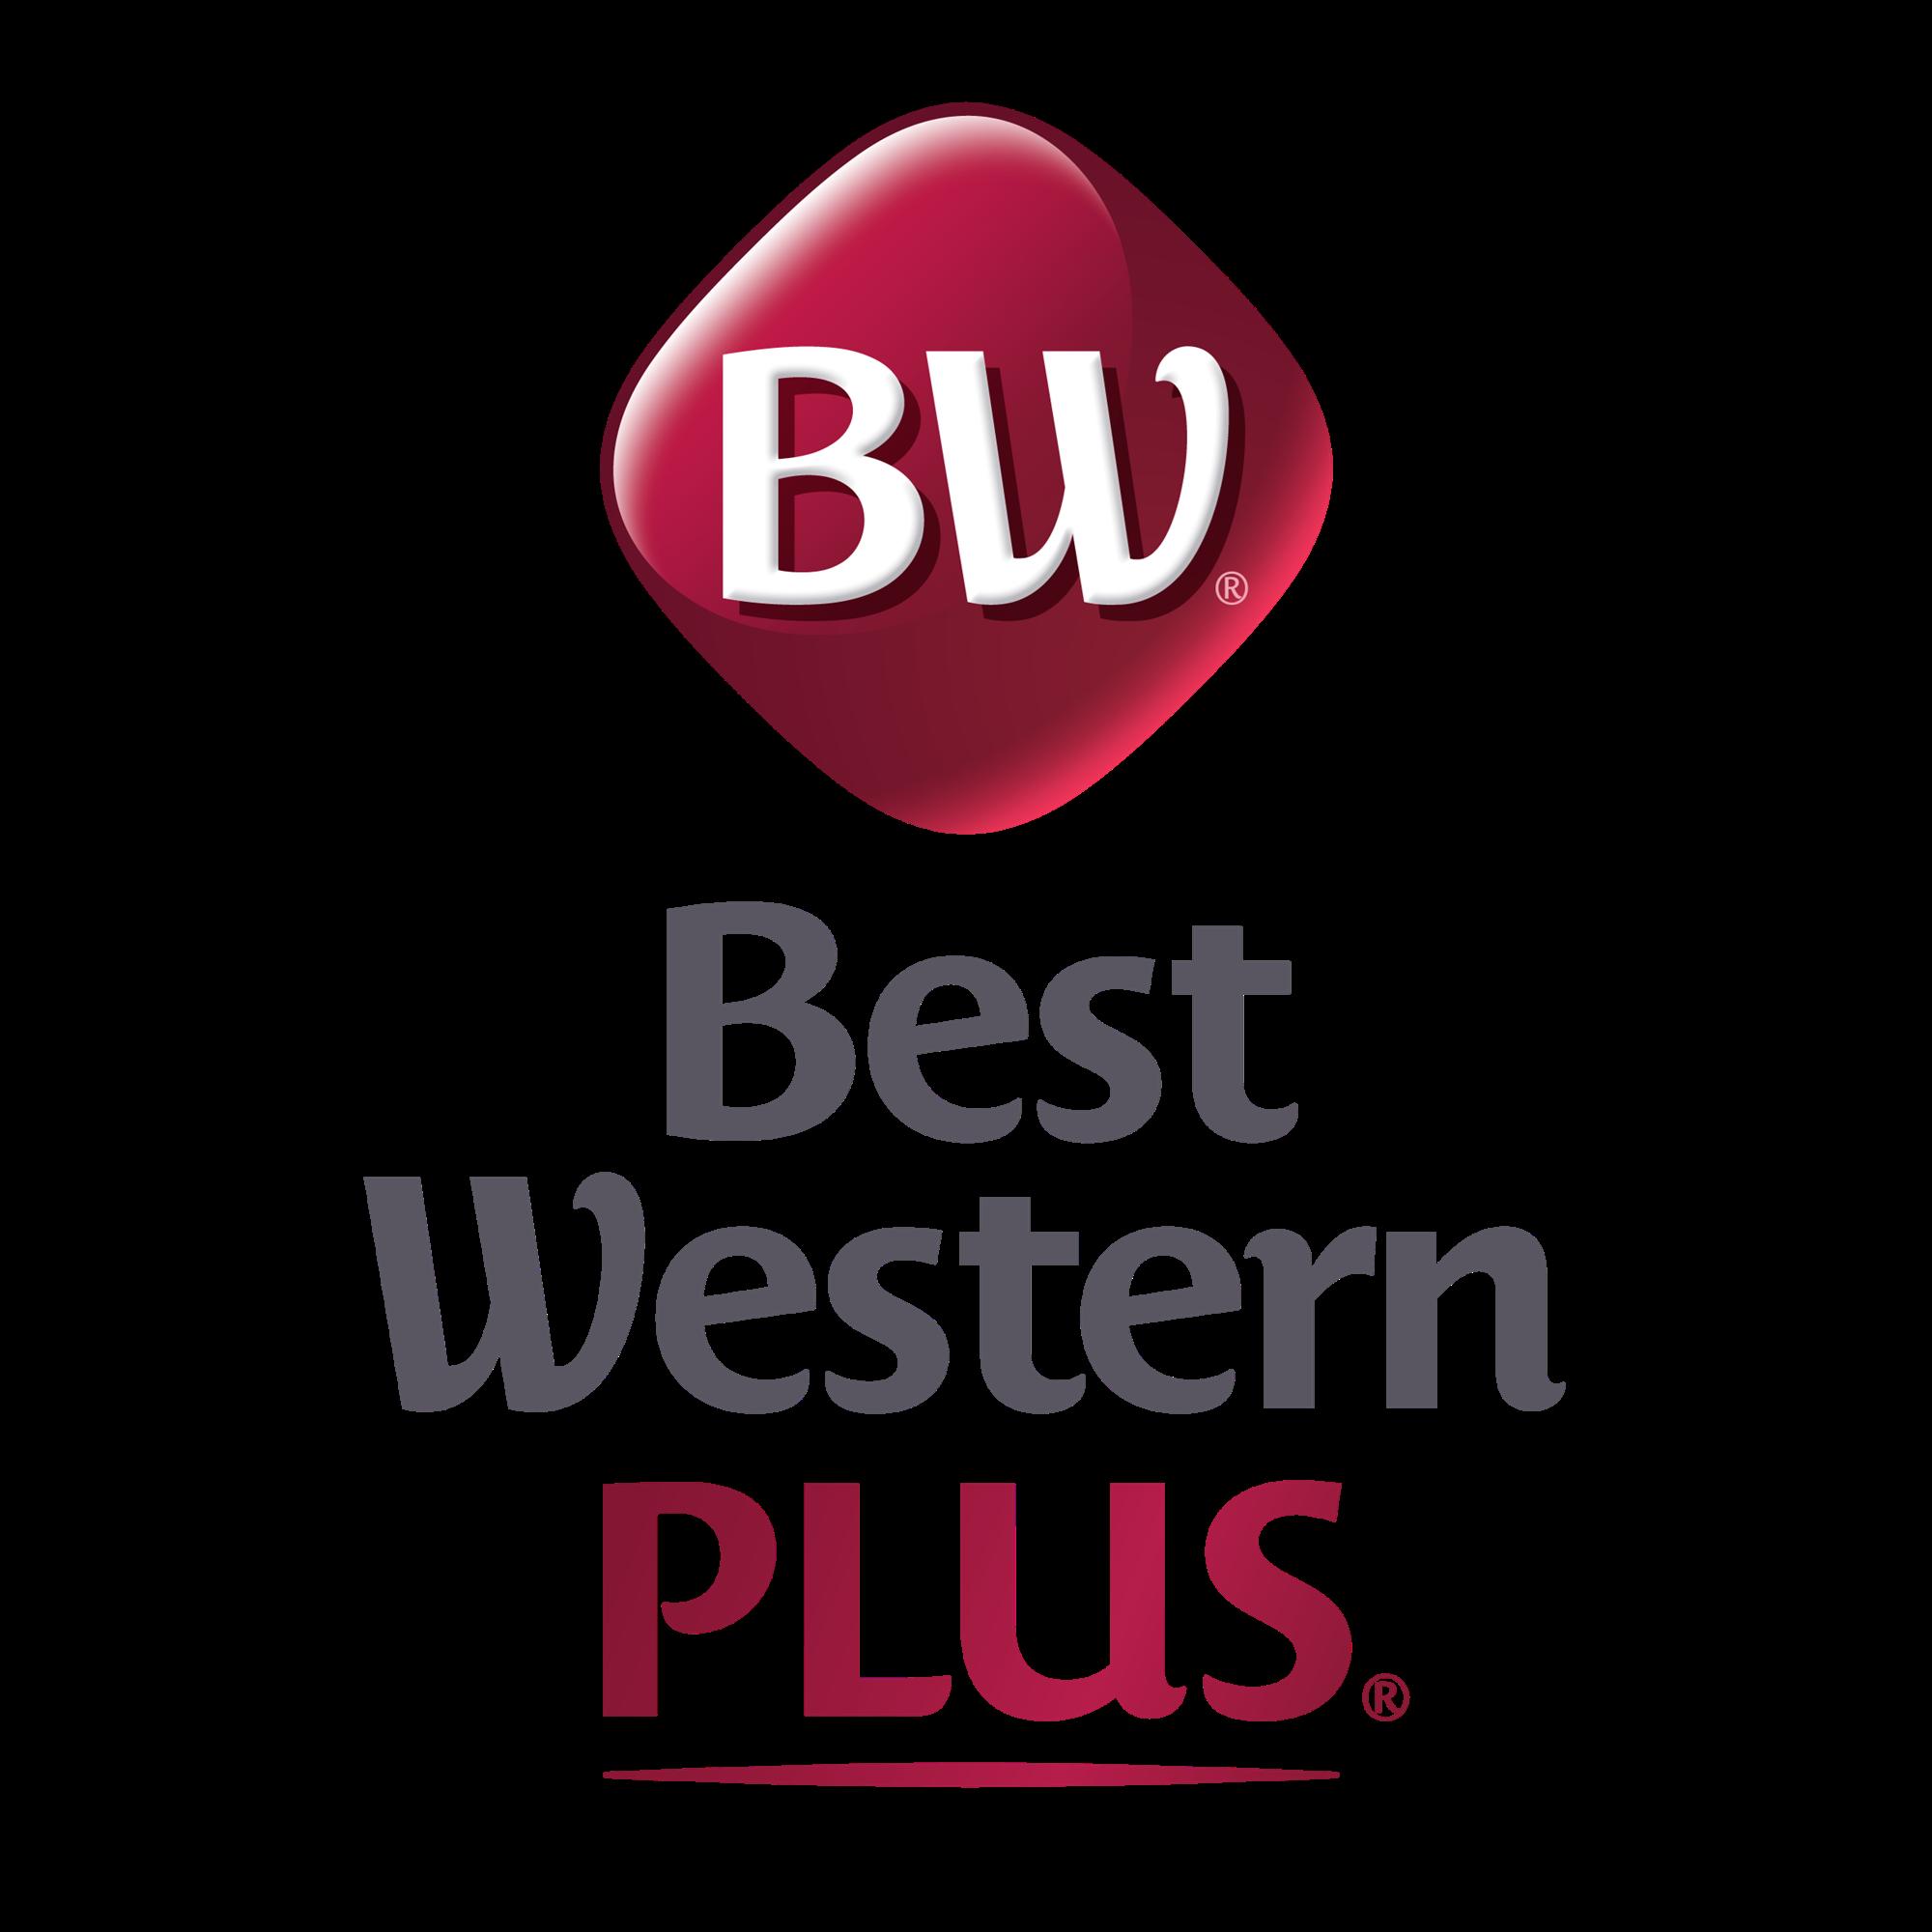 Best Western Plus Best Western Food Logo Design Cincinnati Childrens Hospital